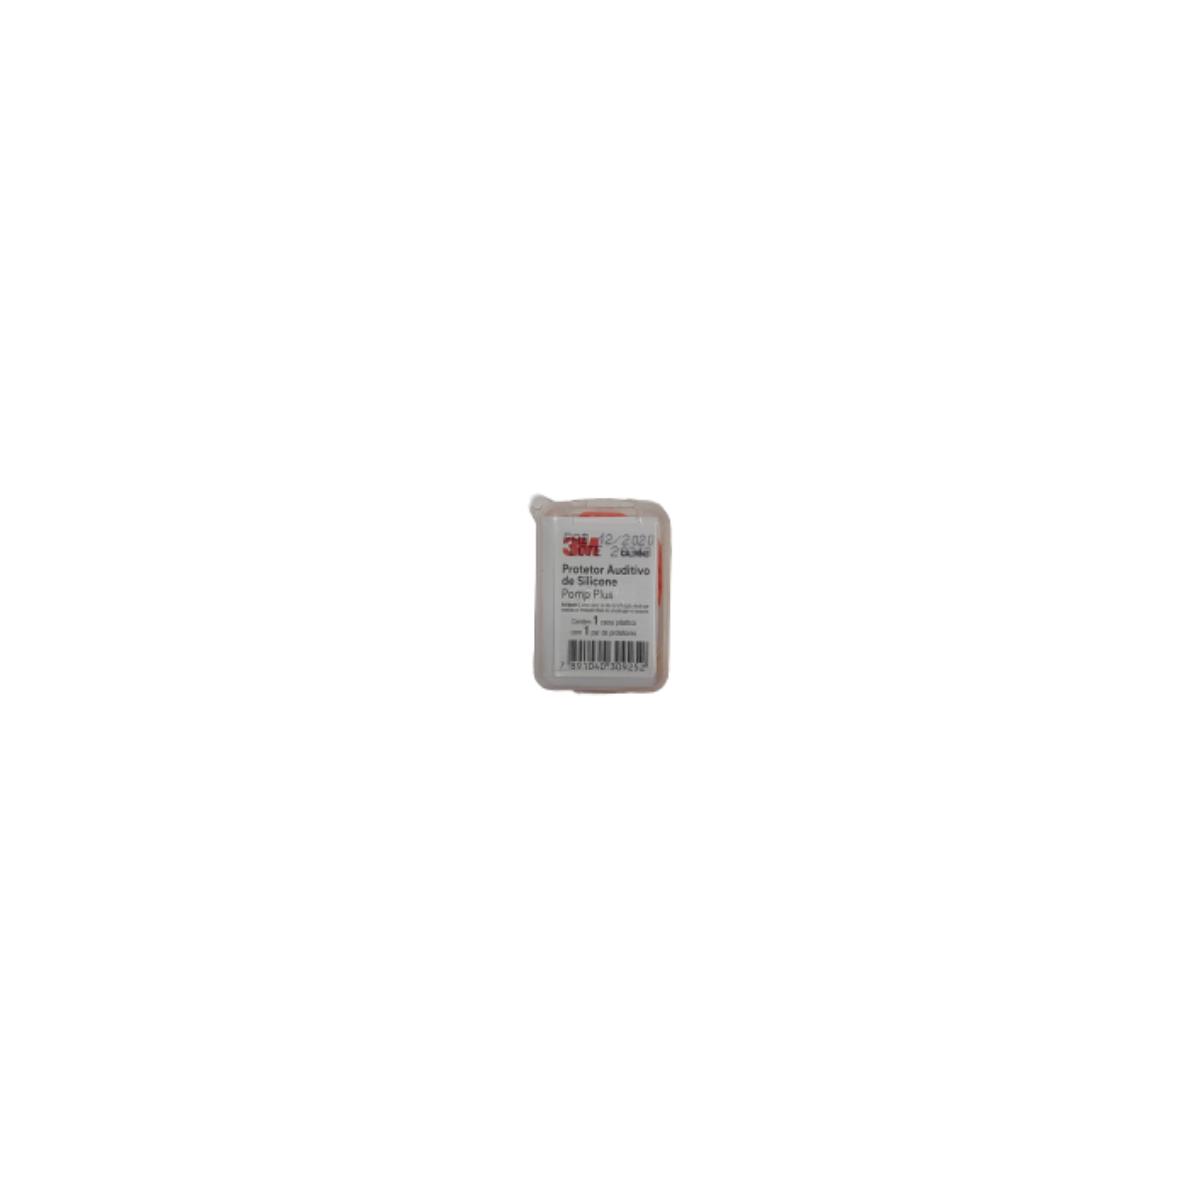 Protetor Auditivo de Silicone (43011)